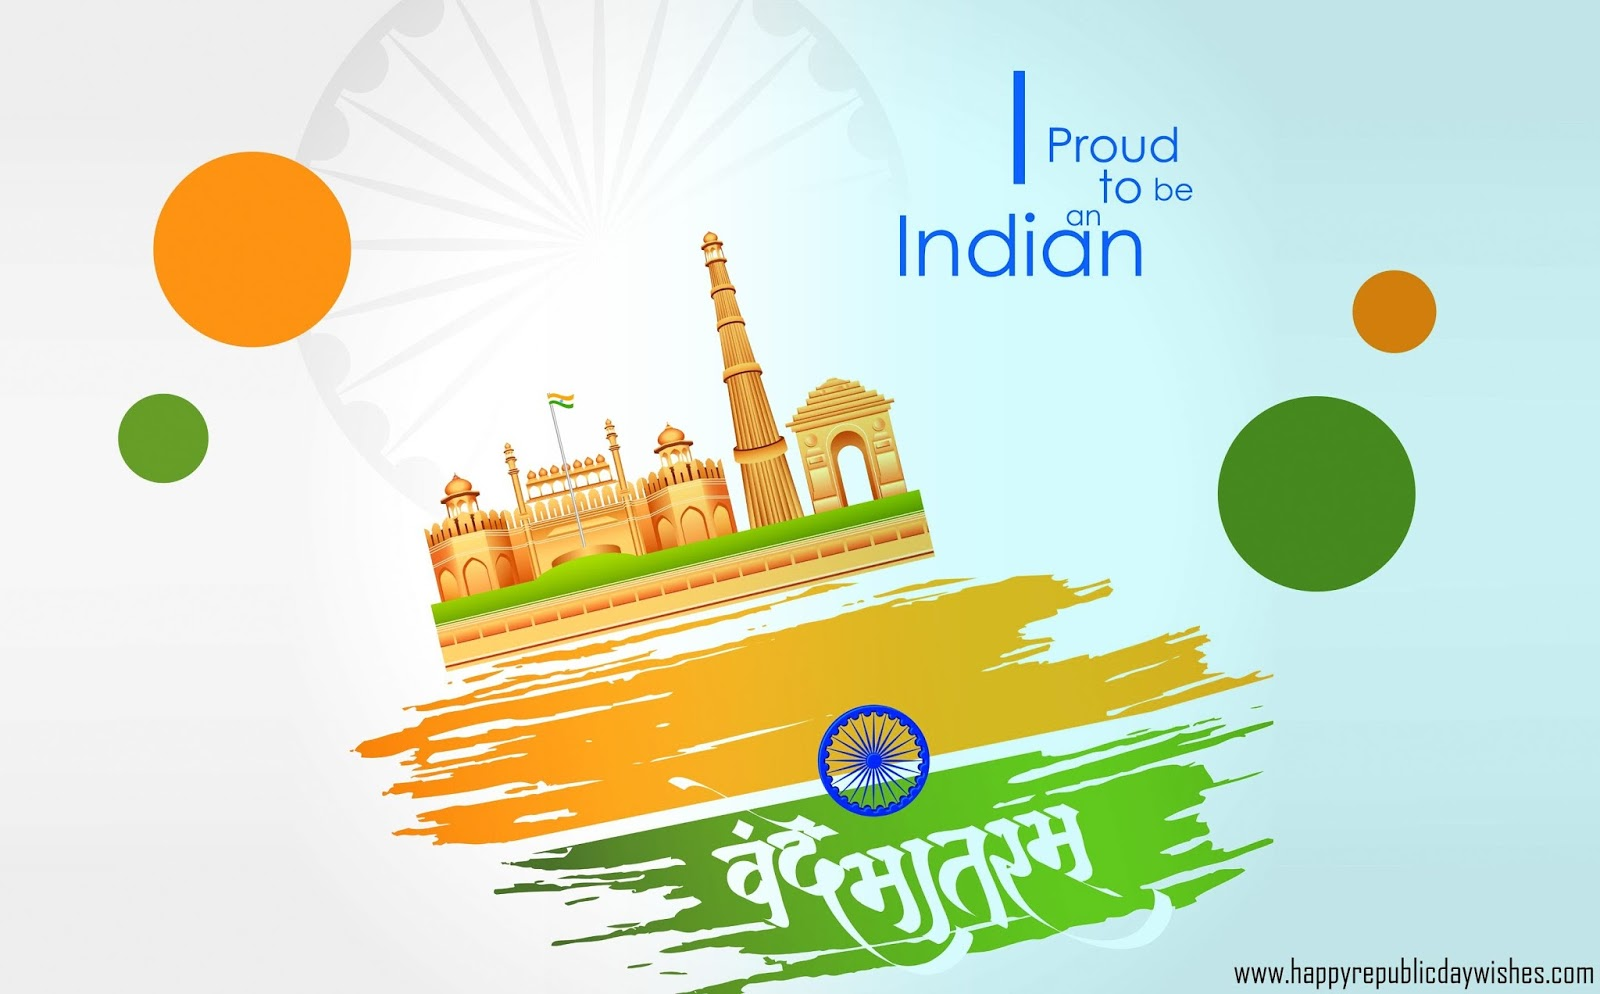 Ghanshyam Maharaj Wallpaper Hd Happy Republic Day 2019 Images Hd Pics Download Photos For